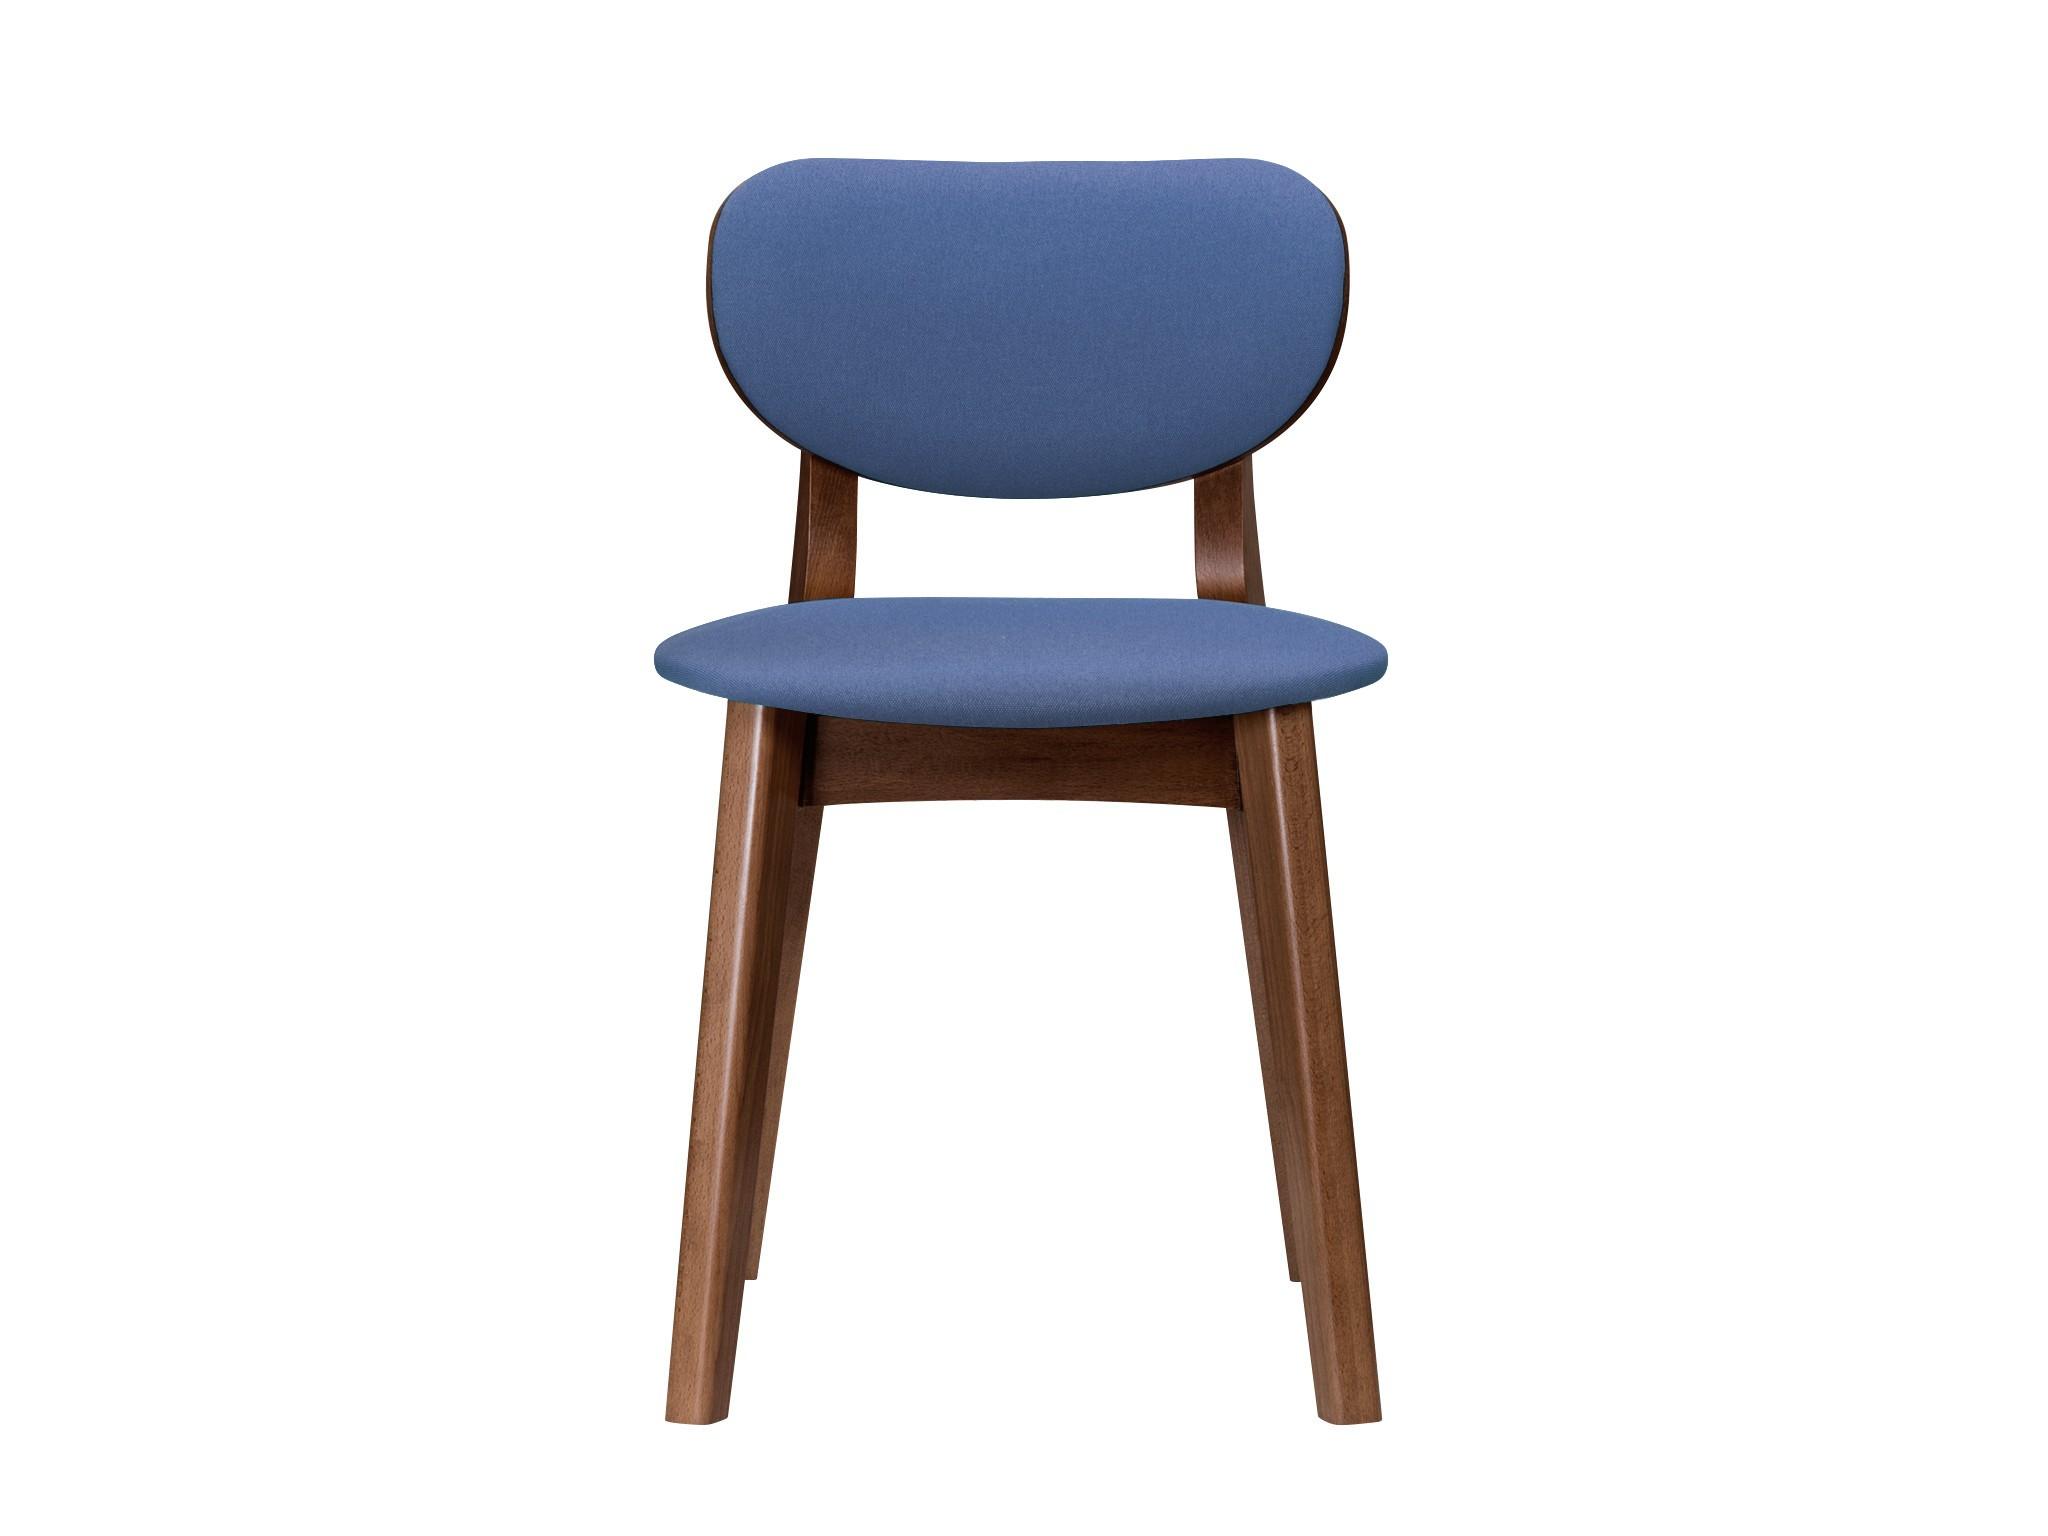 Кухонный стул MyFurnish 15439956 от thefurnish